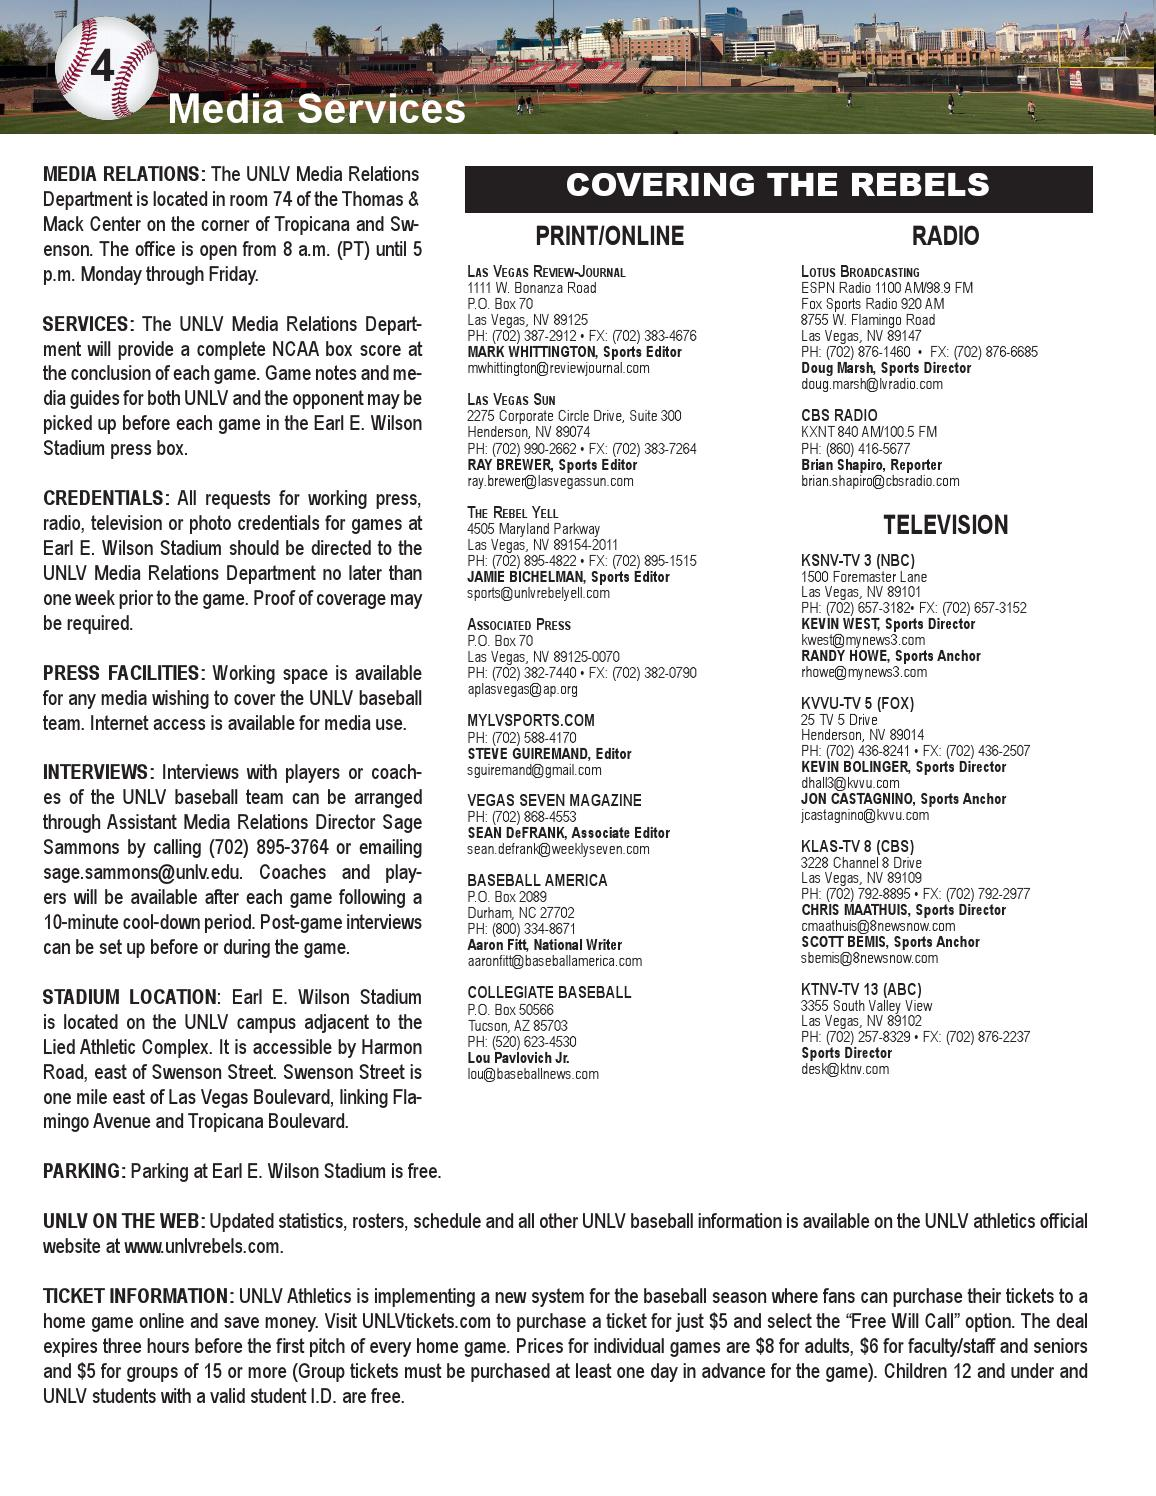 2014 UNLV Baseball Guide by UNLV Sports Information - issuu